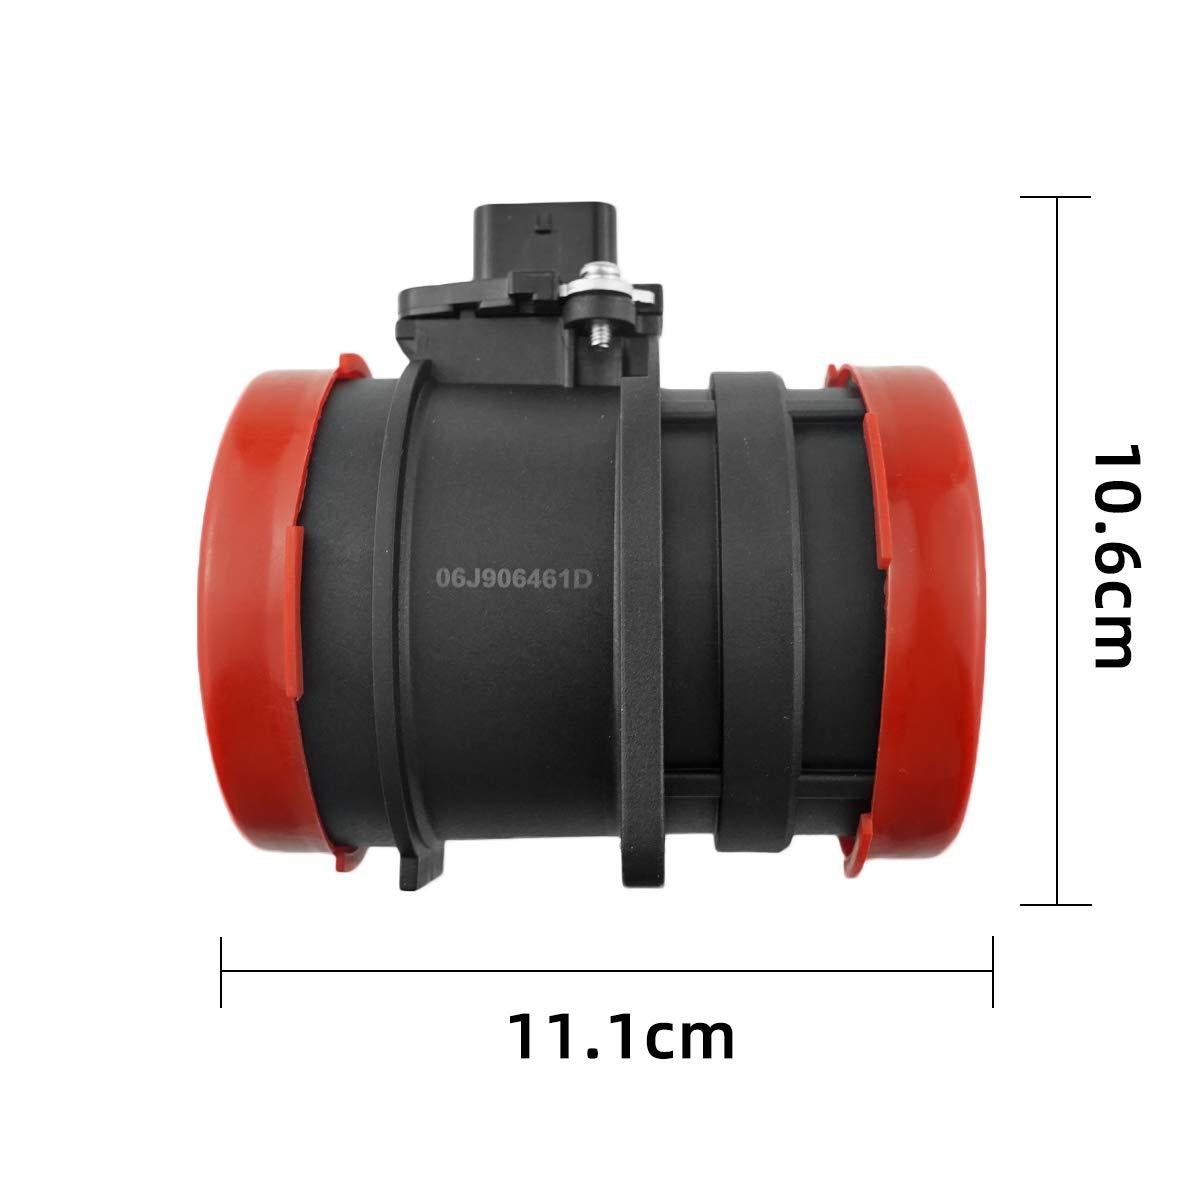 06J906461D Mass Air Flow Sensor Meter MAF For VW 09-13 Audi A3 Quattro 10-12 Audi A5 Quattro 07-13 Audi TT 09-13 Volkswagen GTI 2505079 AFH6037